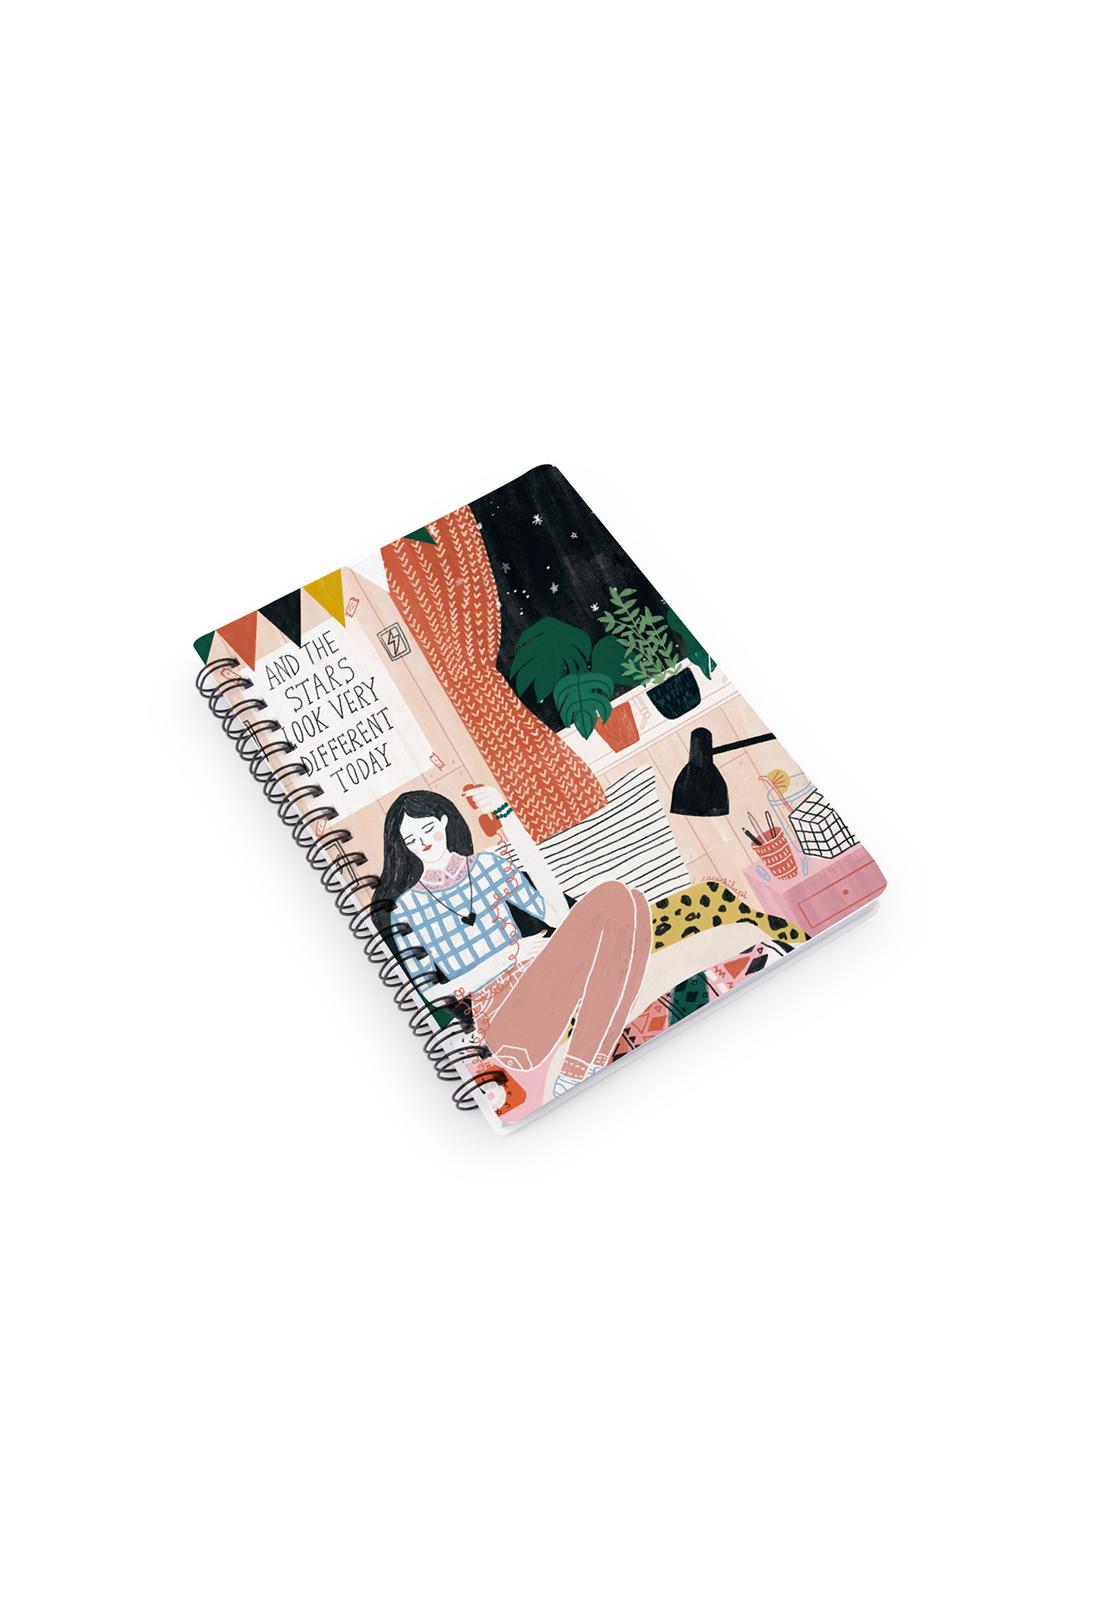 Cuaderno S Ni?a Pieza